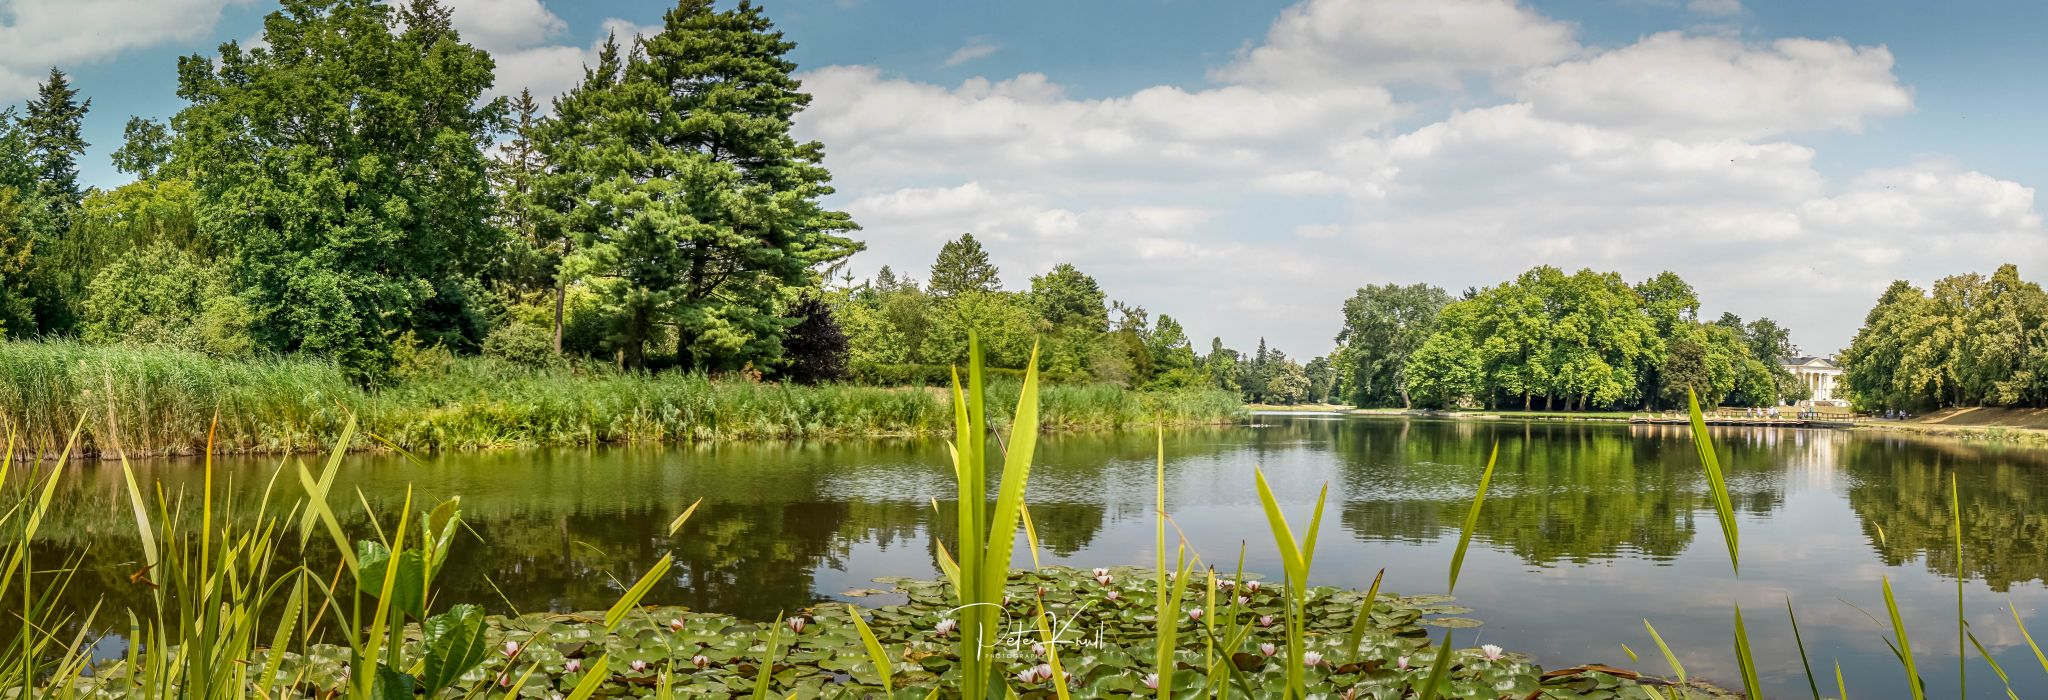 Landscaped gardens at Wörlitz Palace, Germany